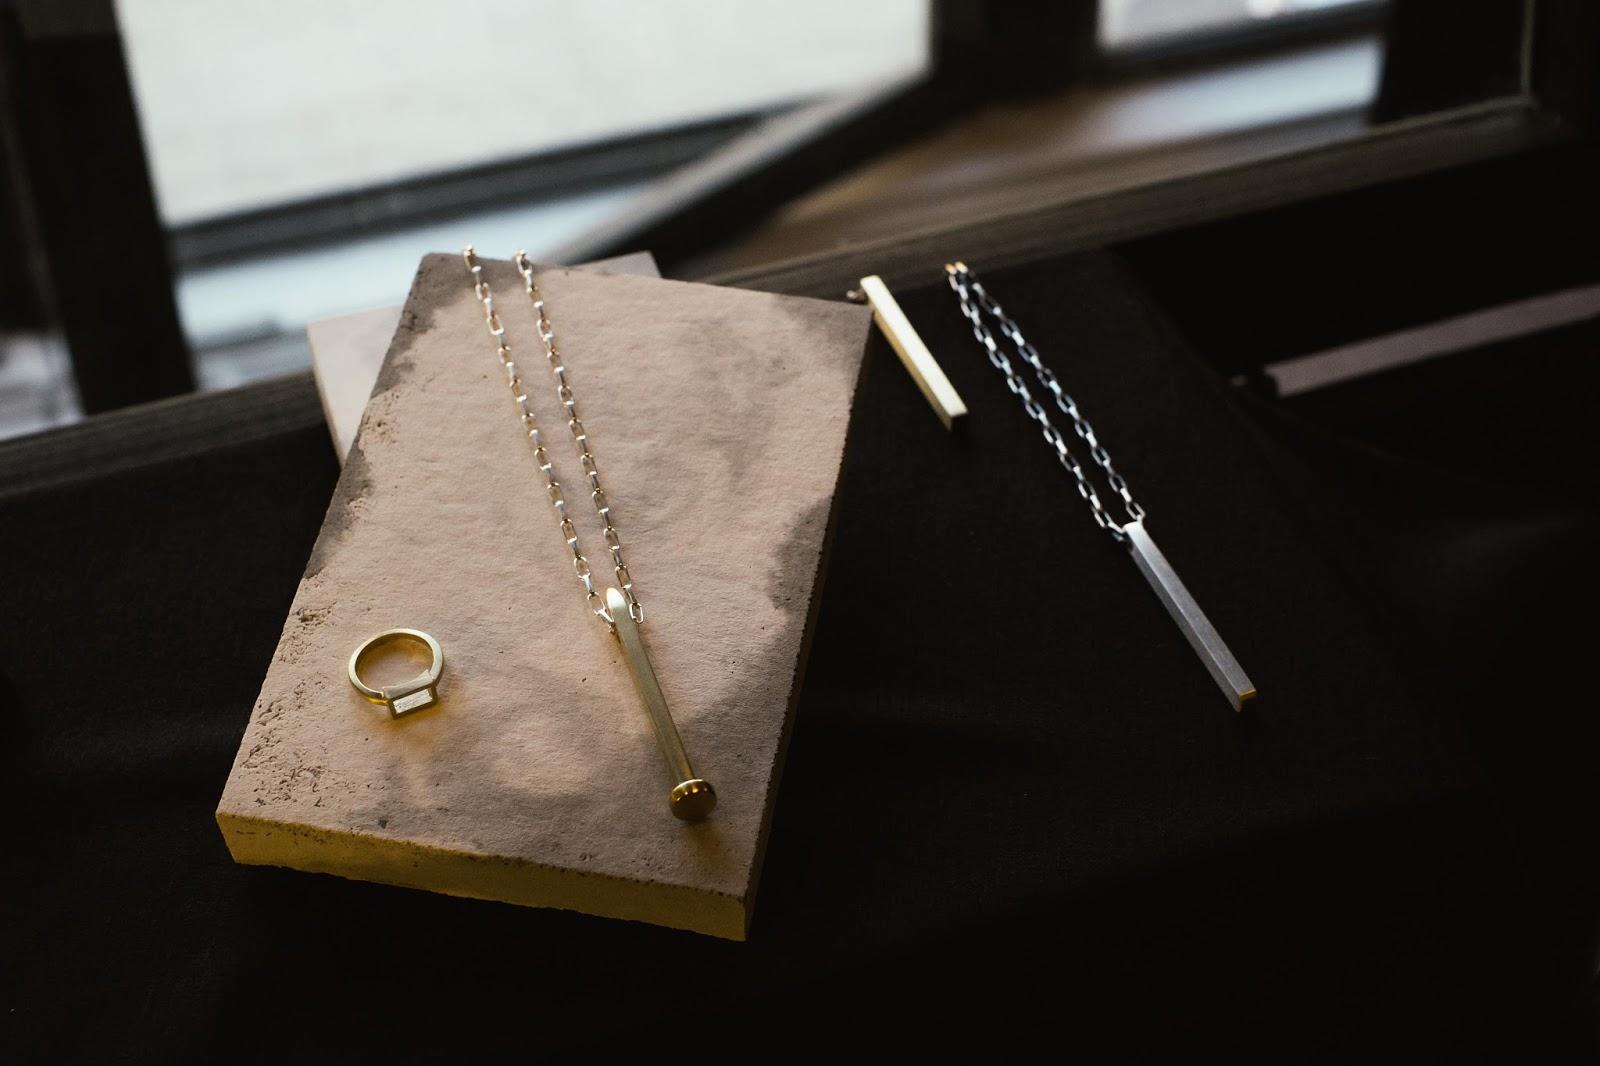 LZZR-%2Bmybelonging-lzzr-jewelry-losangeles-designer-dtla-acehotel-10.jpg